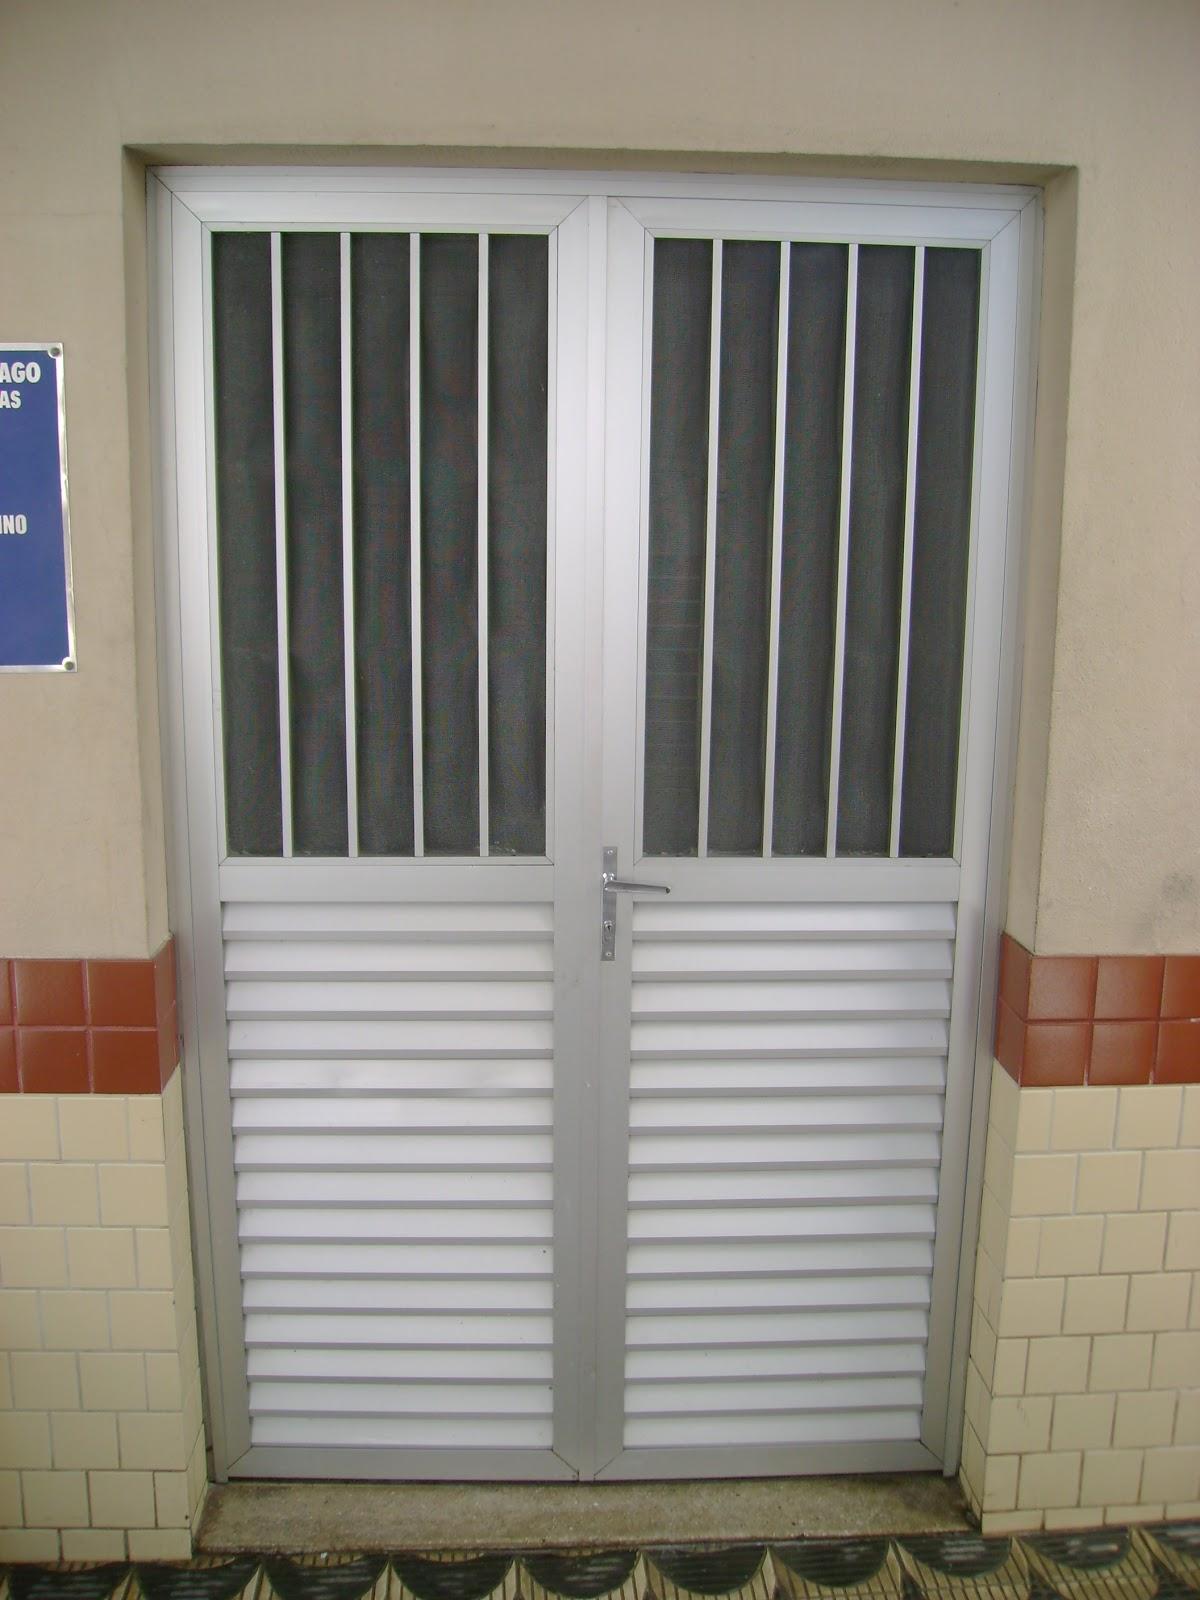 #744530 METALPLAST Esquadrias Forros e Divisórias: Porta de alumínio 1836 Janela De Aluminio Preço Natal Rn